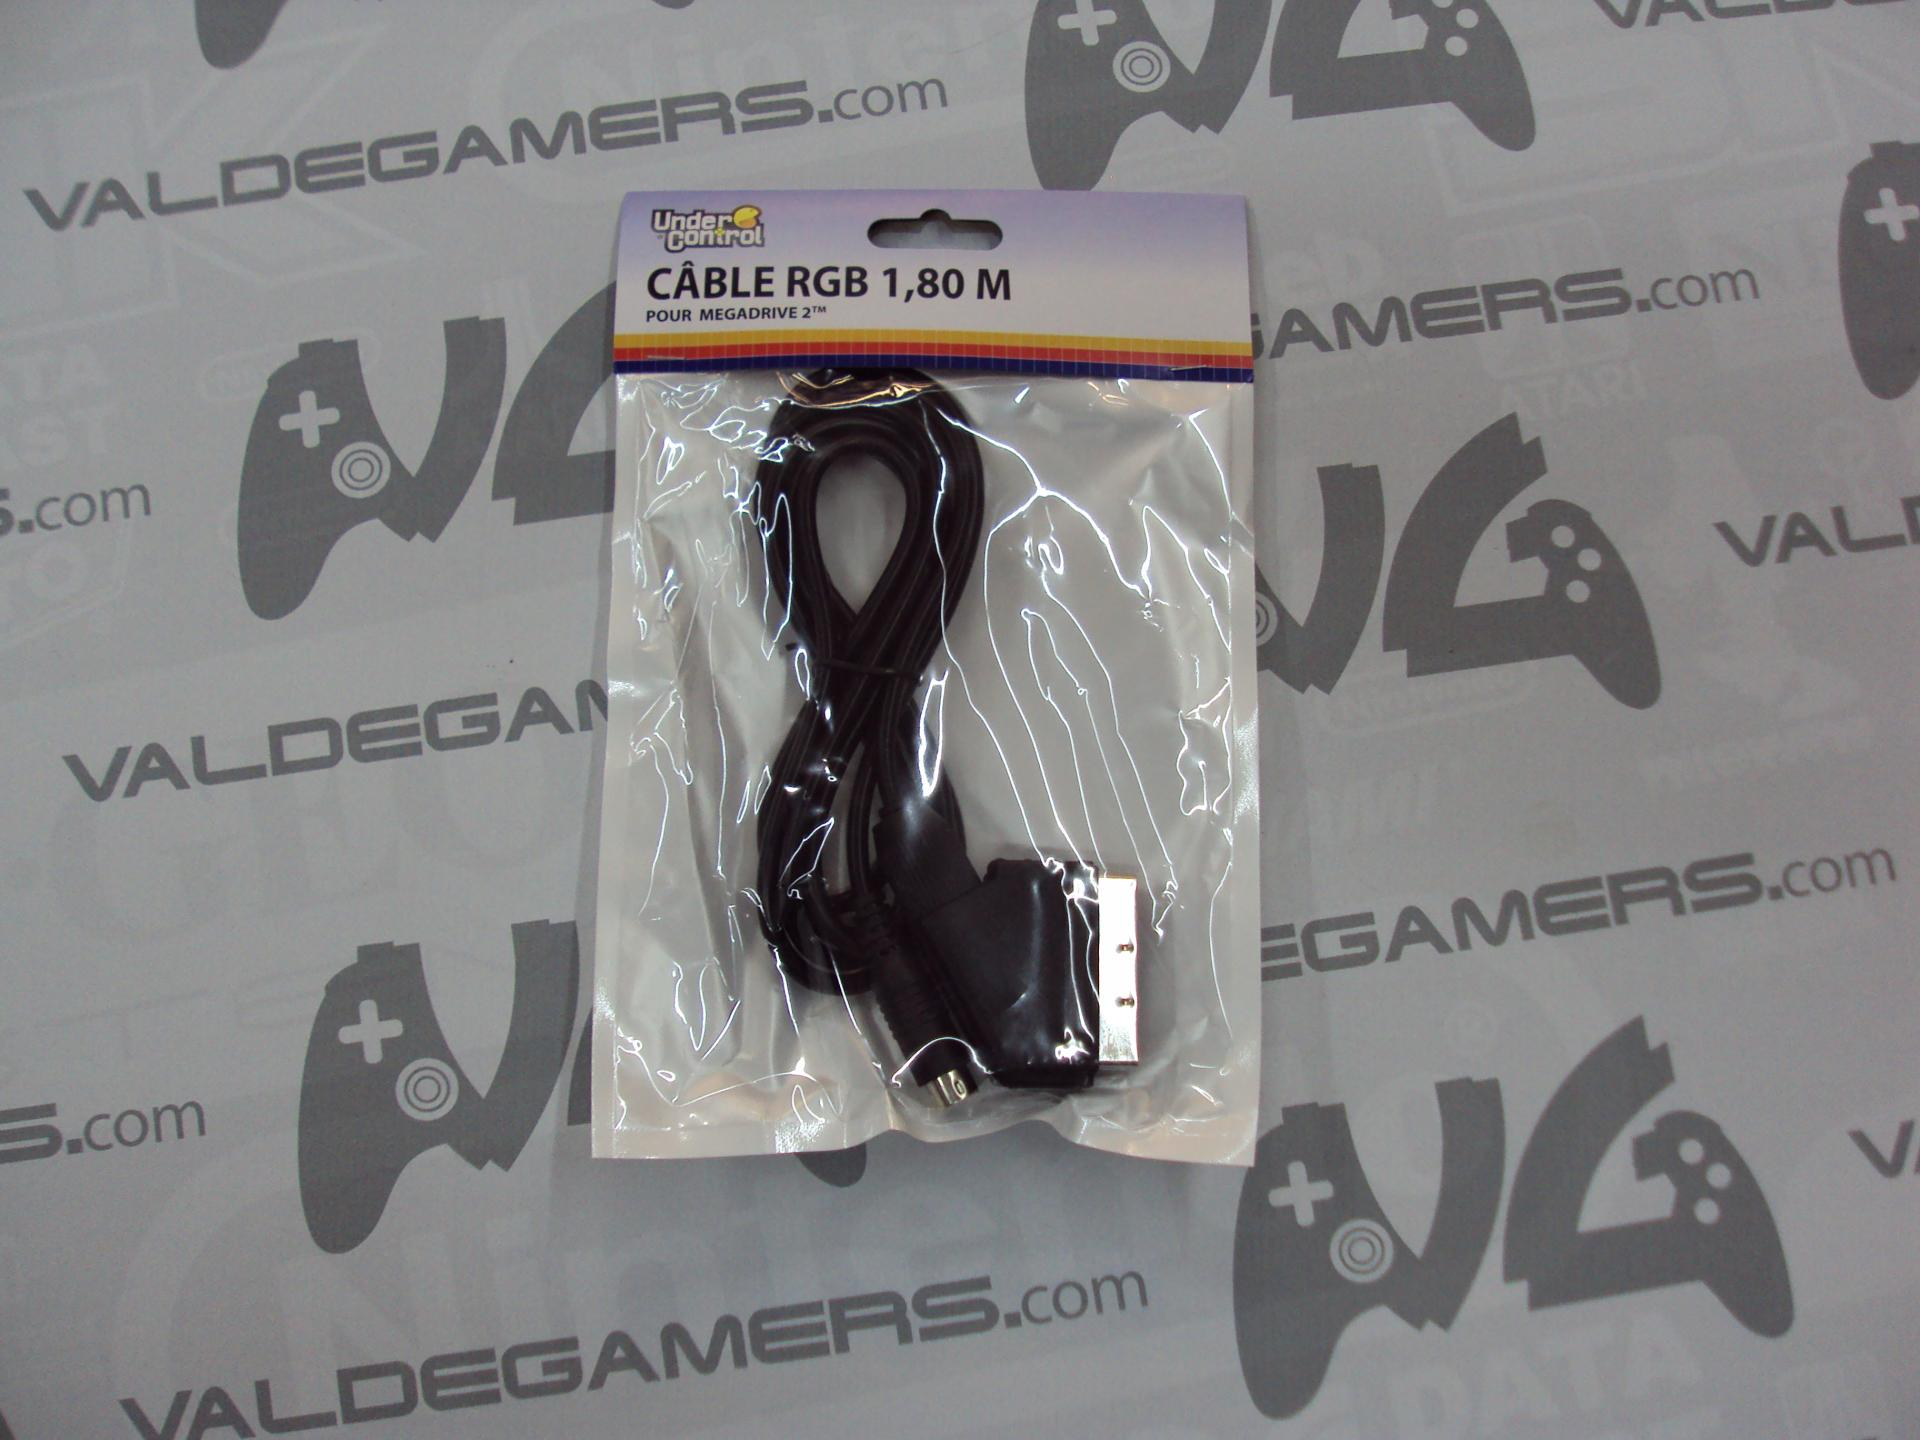 Cable RGB mega drive 2 - NUEVO